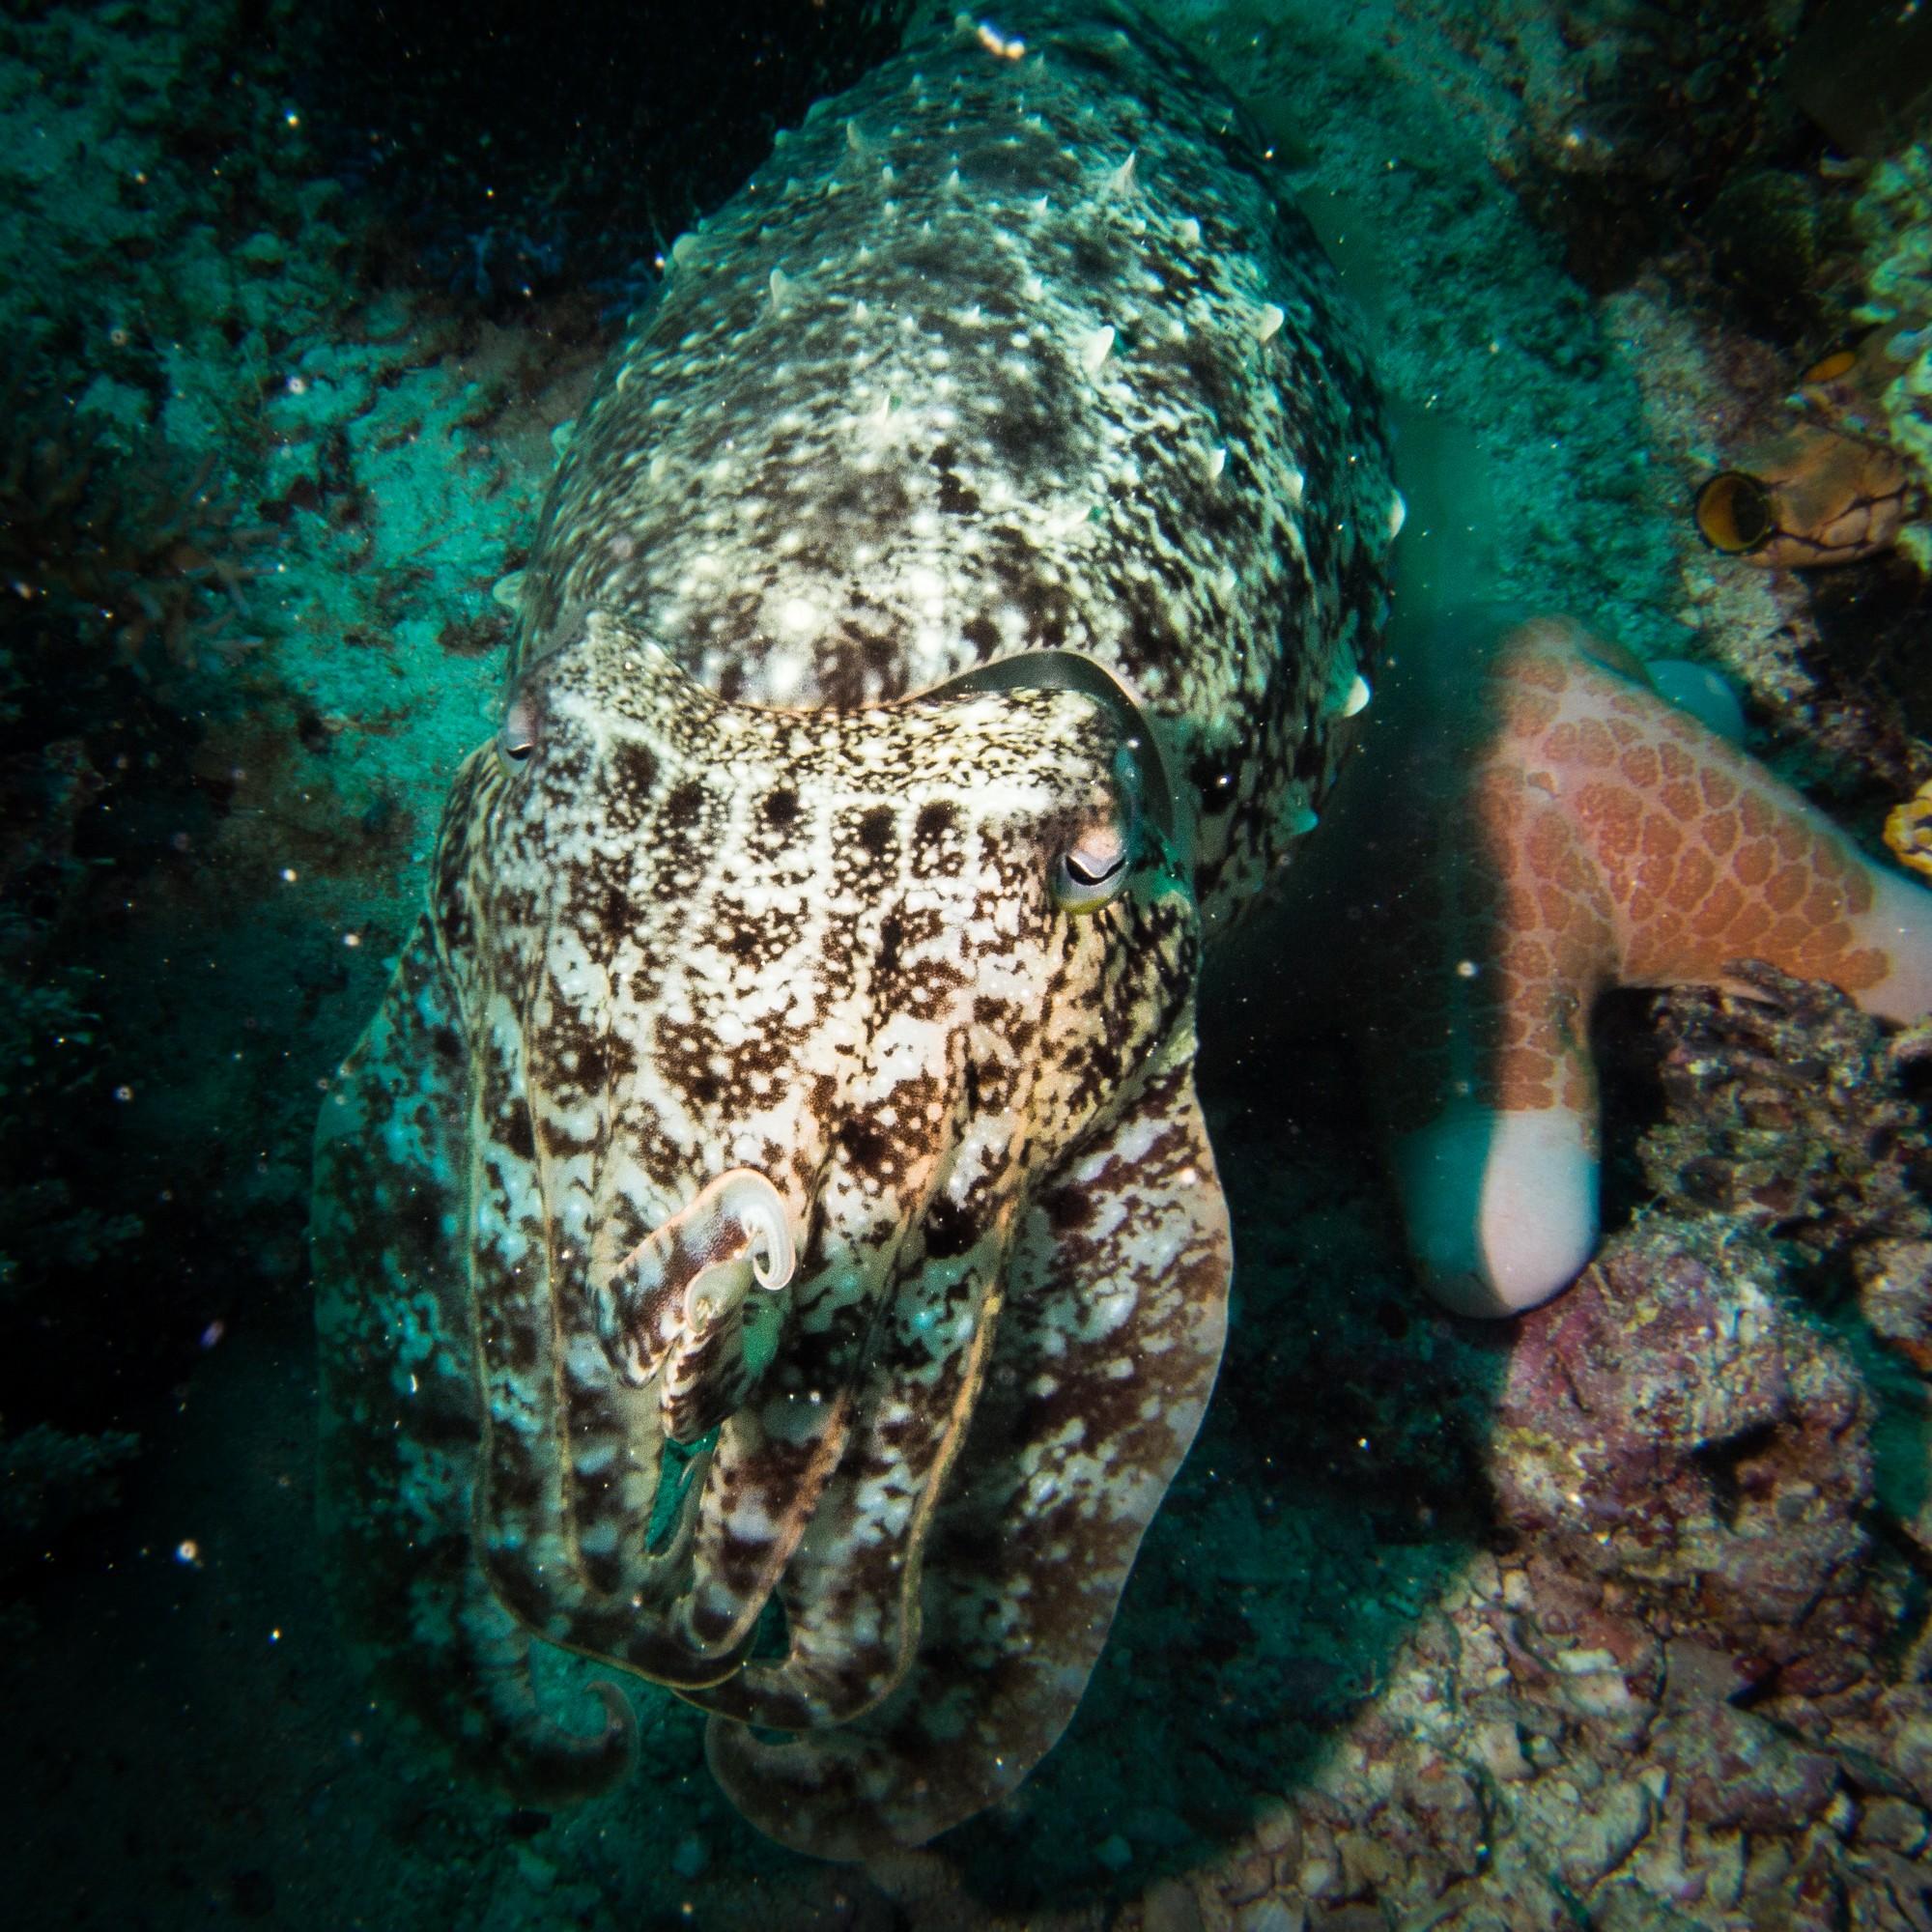 Dambilah Slope dive site Maumere